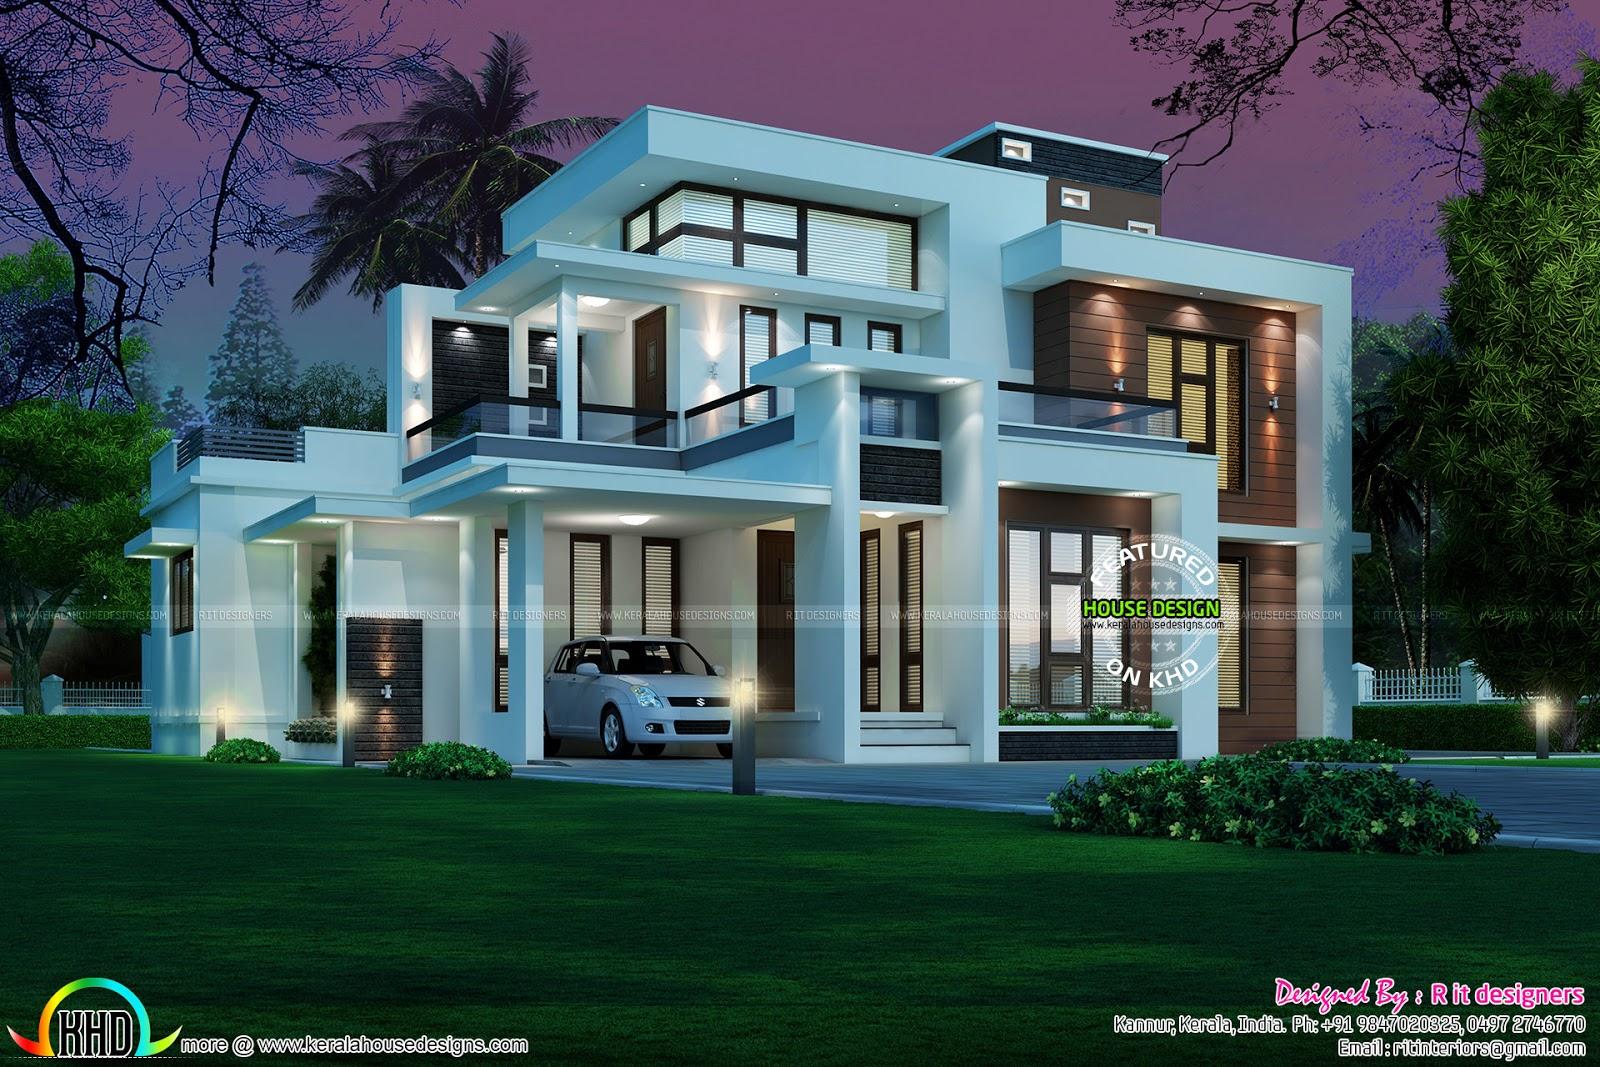 Box model contemporary 2215 sq ft 45 lakhs kerala home for Contemporary model houses in kerala